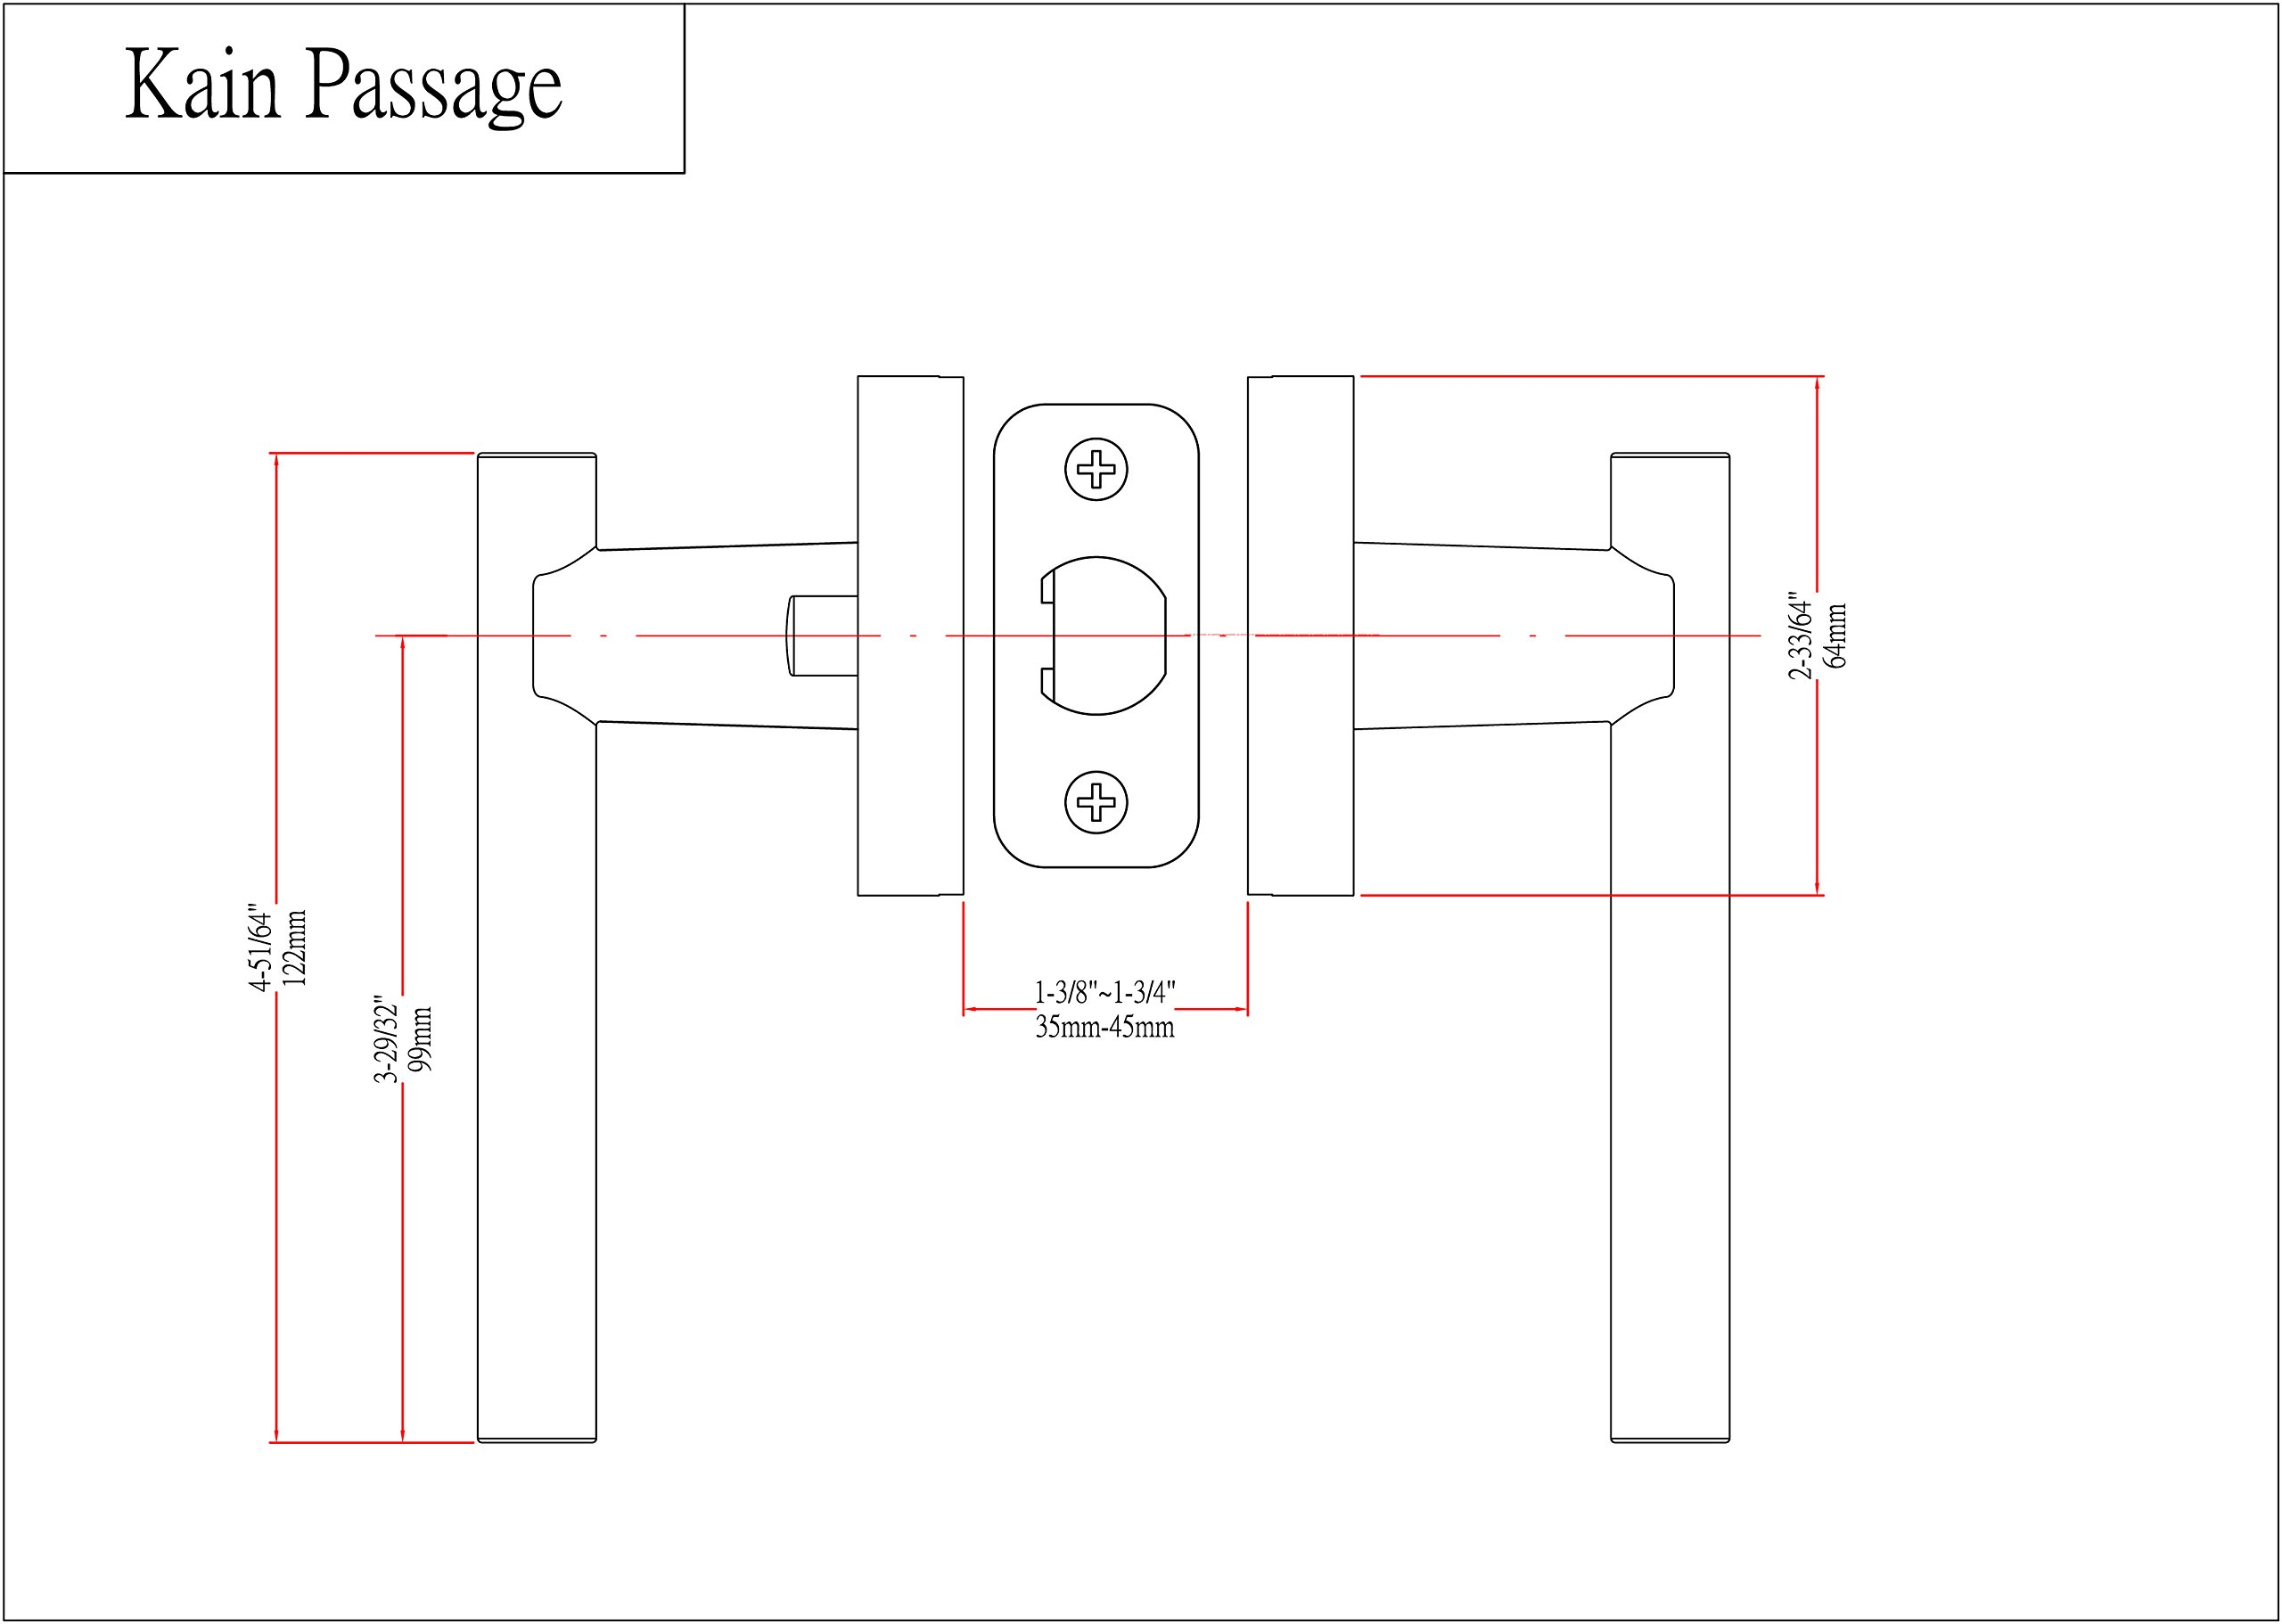 Designers Impressions Kain Design Contemporary Polished Chrome Passage Euro Door Lever Hardware (Hall and Closet)